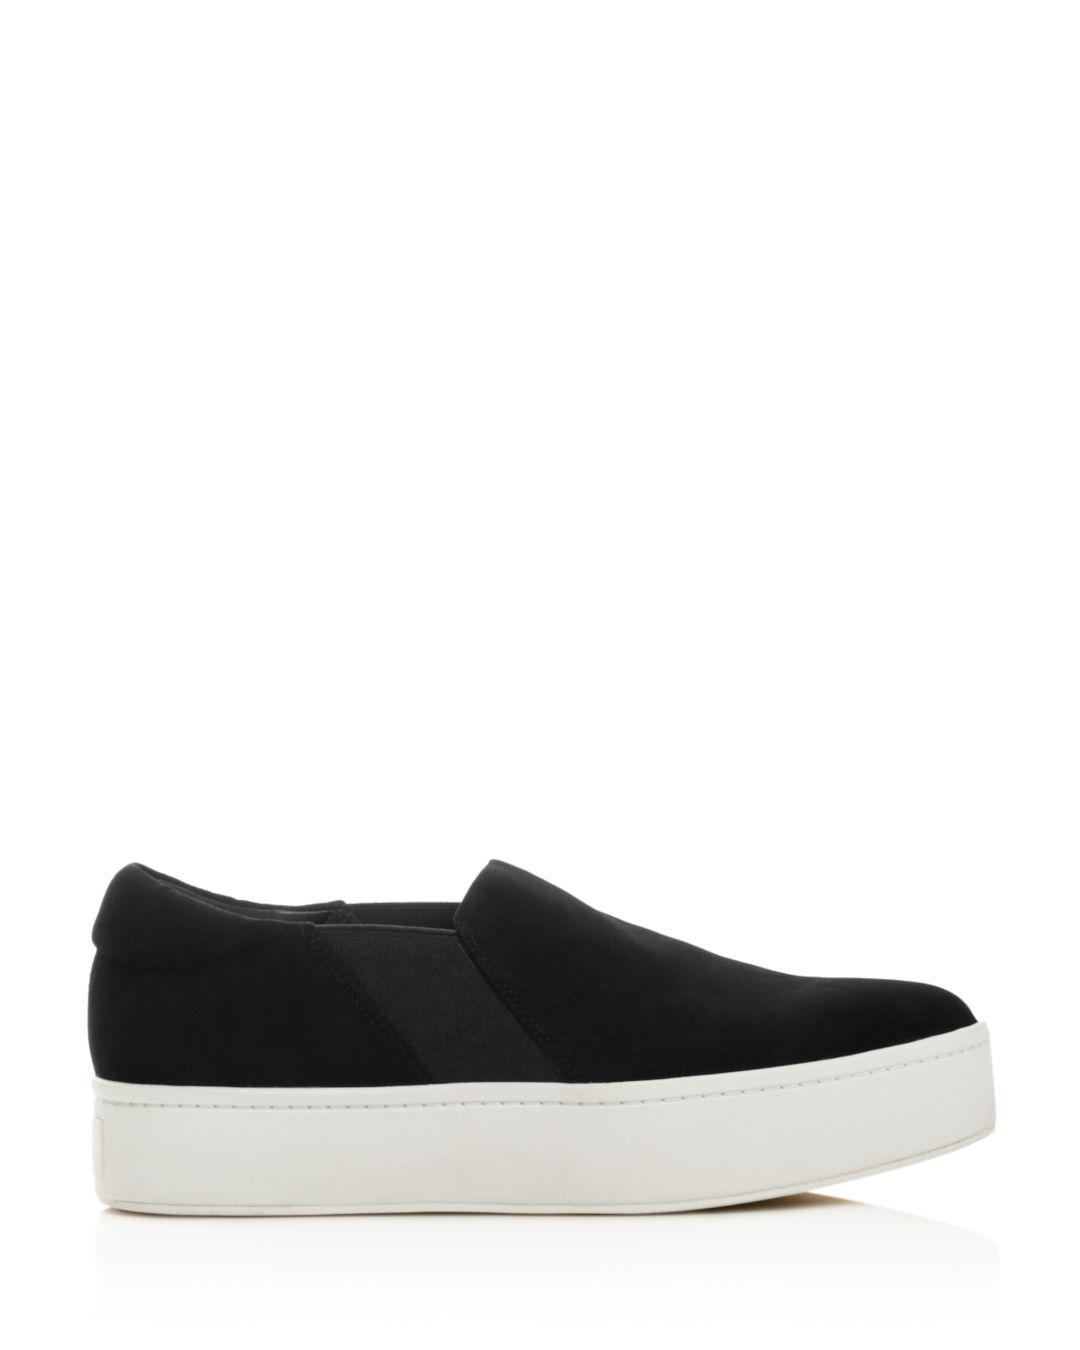 e1bc2d5bad3 Lyst - Vince Warren Suede Platform Slip-on Sneakers in Black